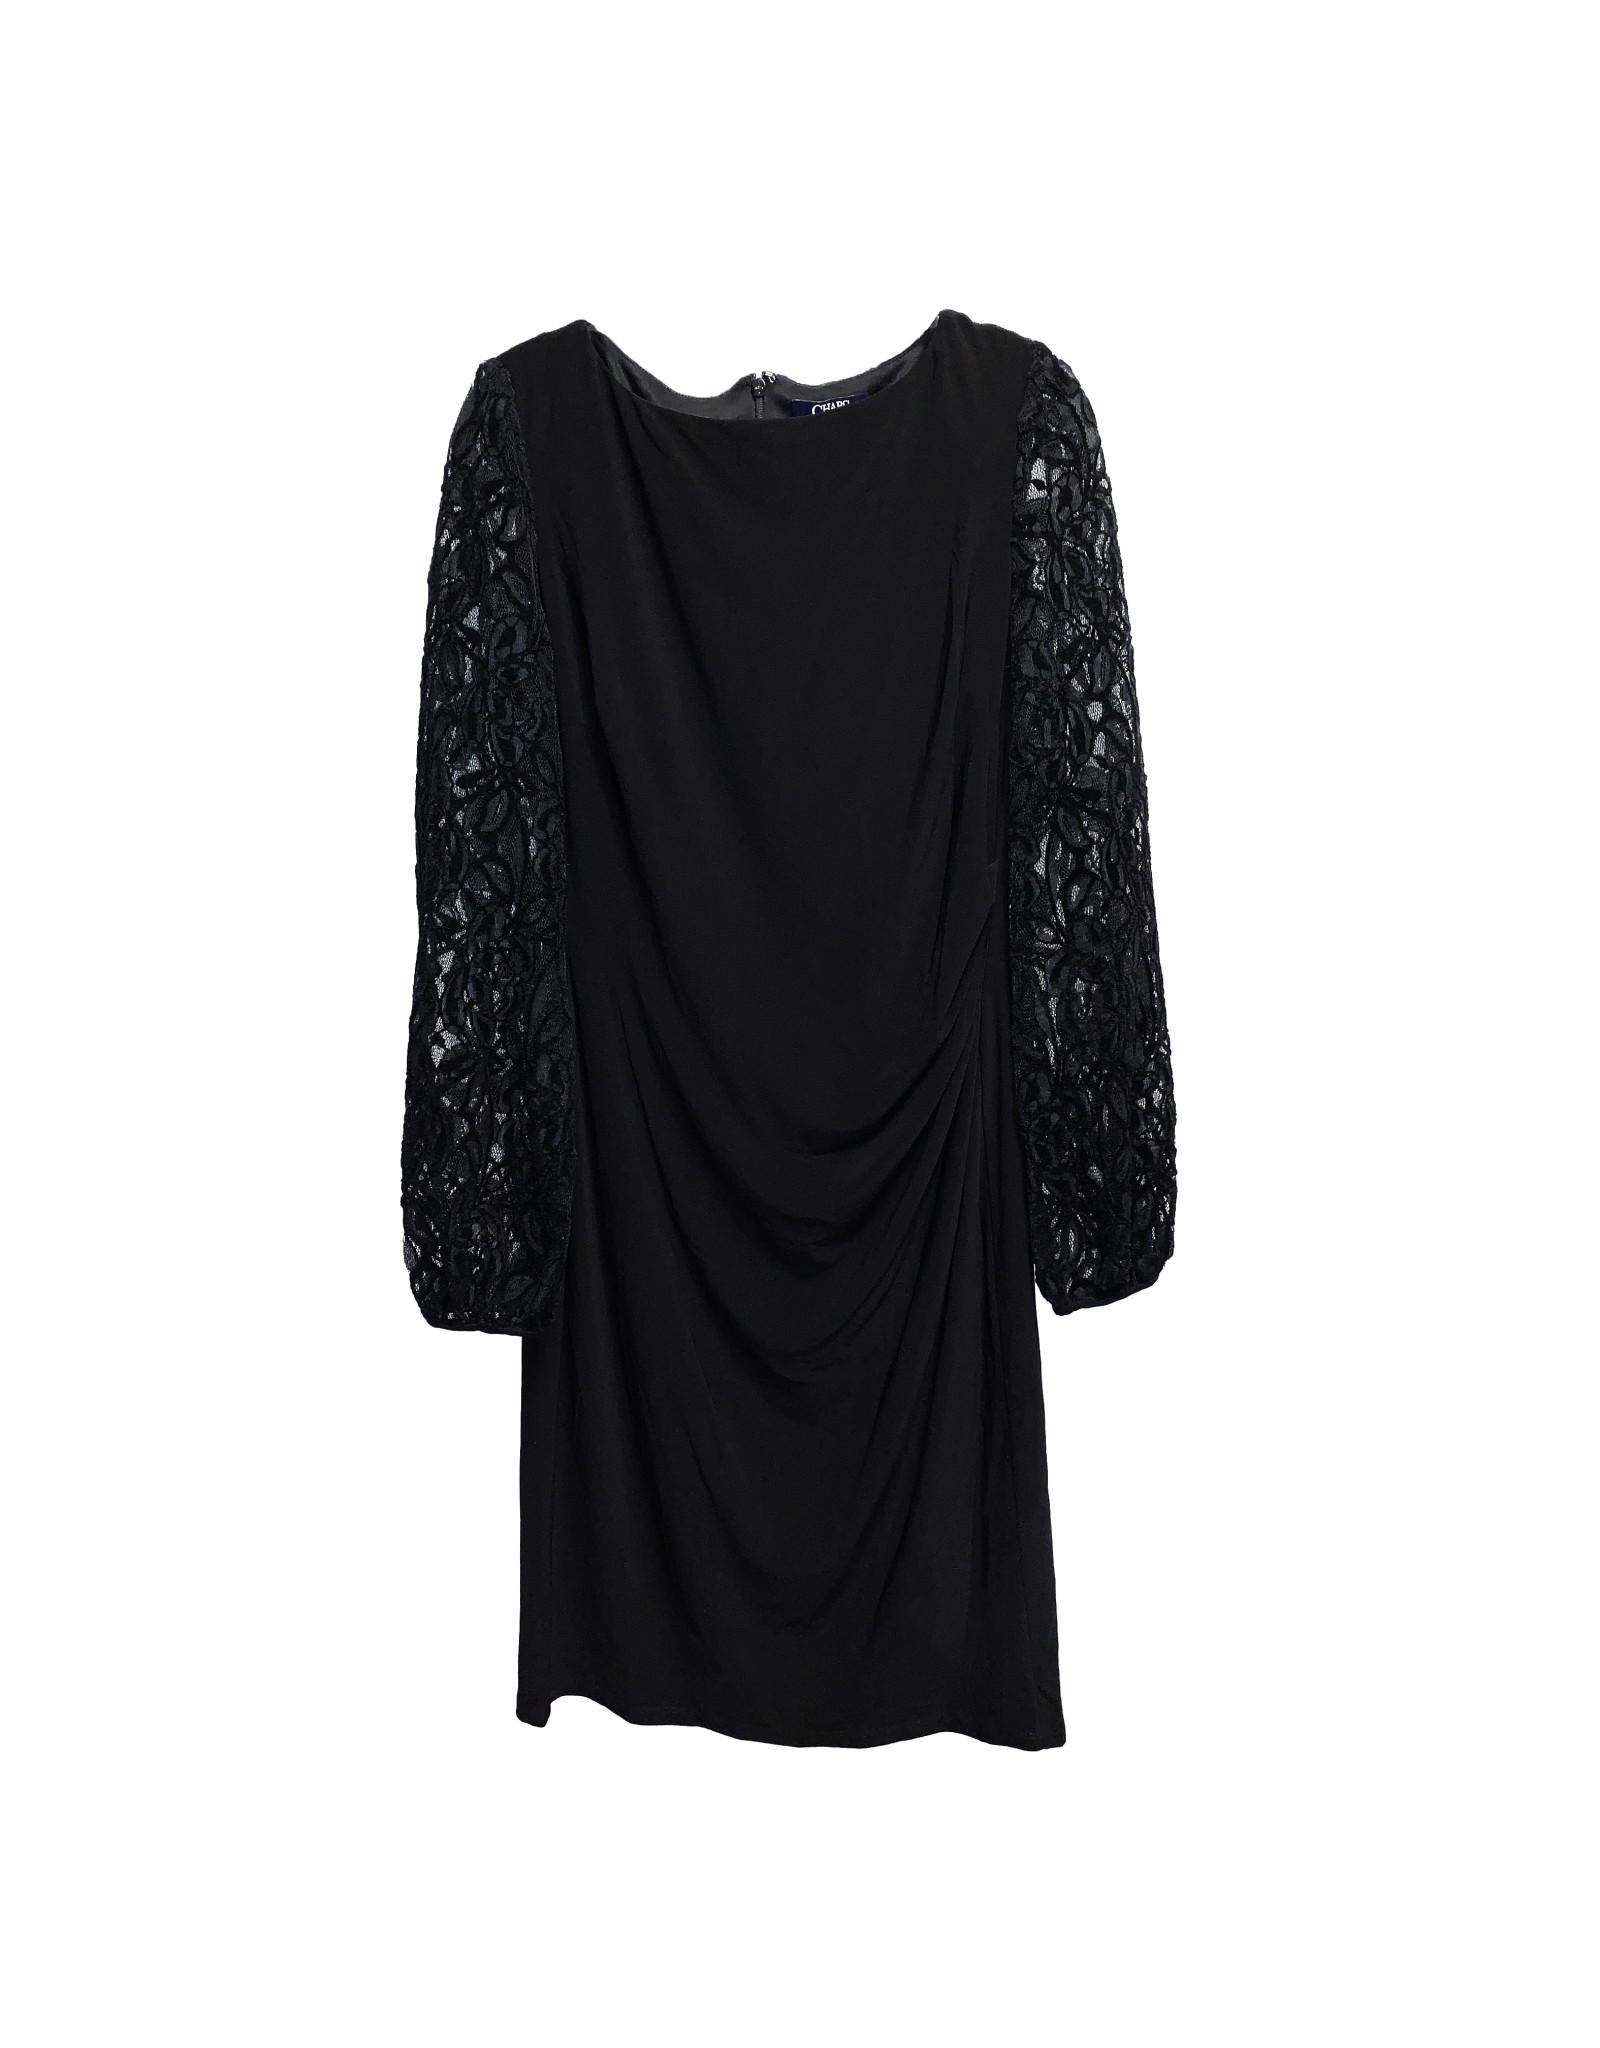 CHAPS Chaps Rachella -Long Sleeve - Day Dress